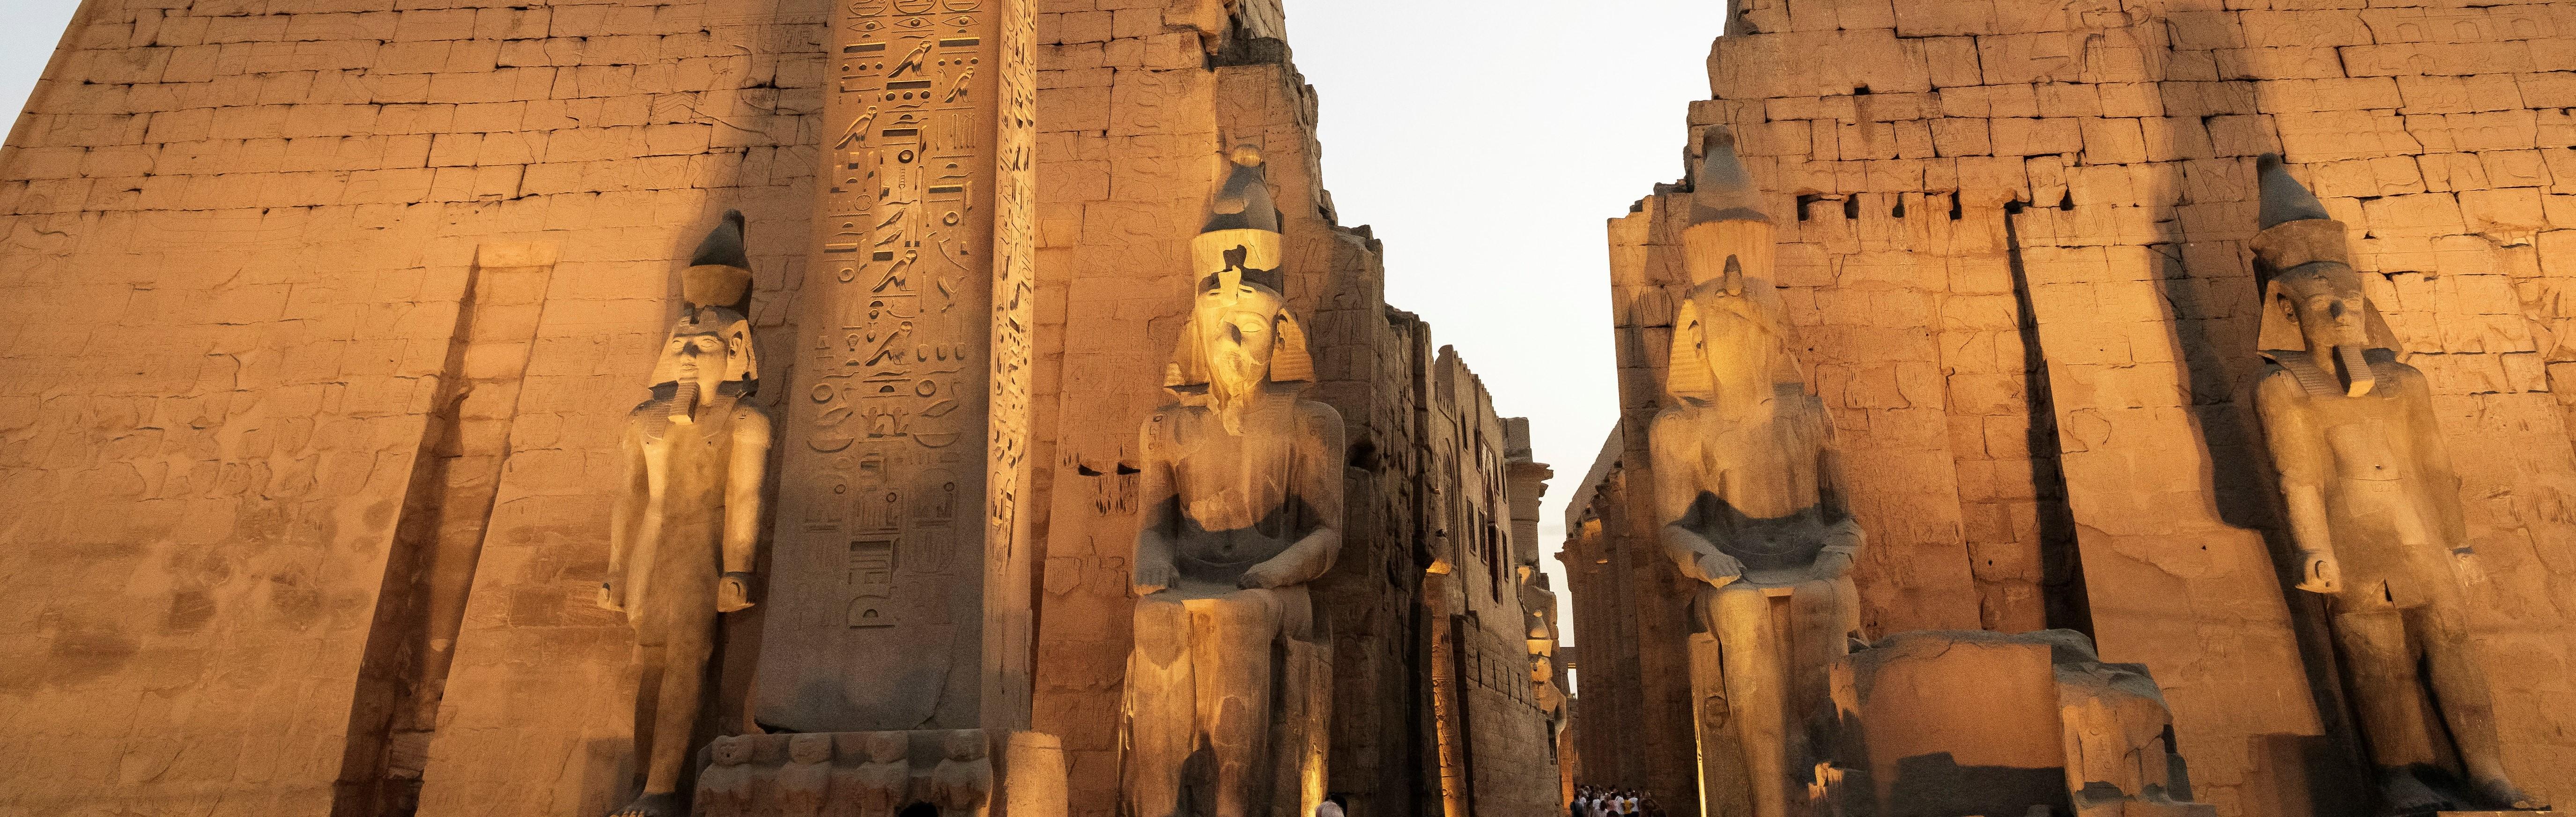 luxor-temples-expert-guide-egypt